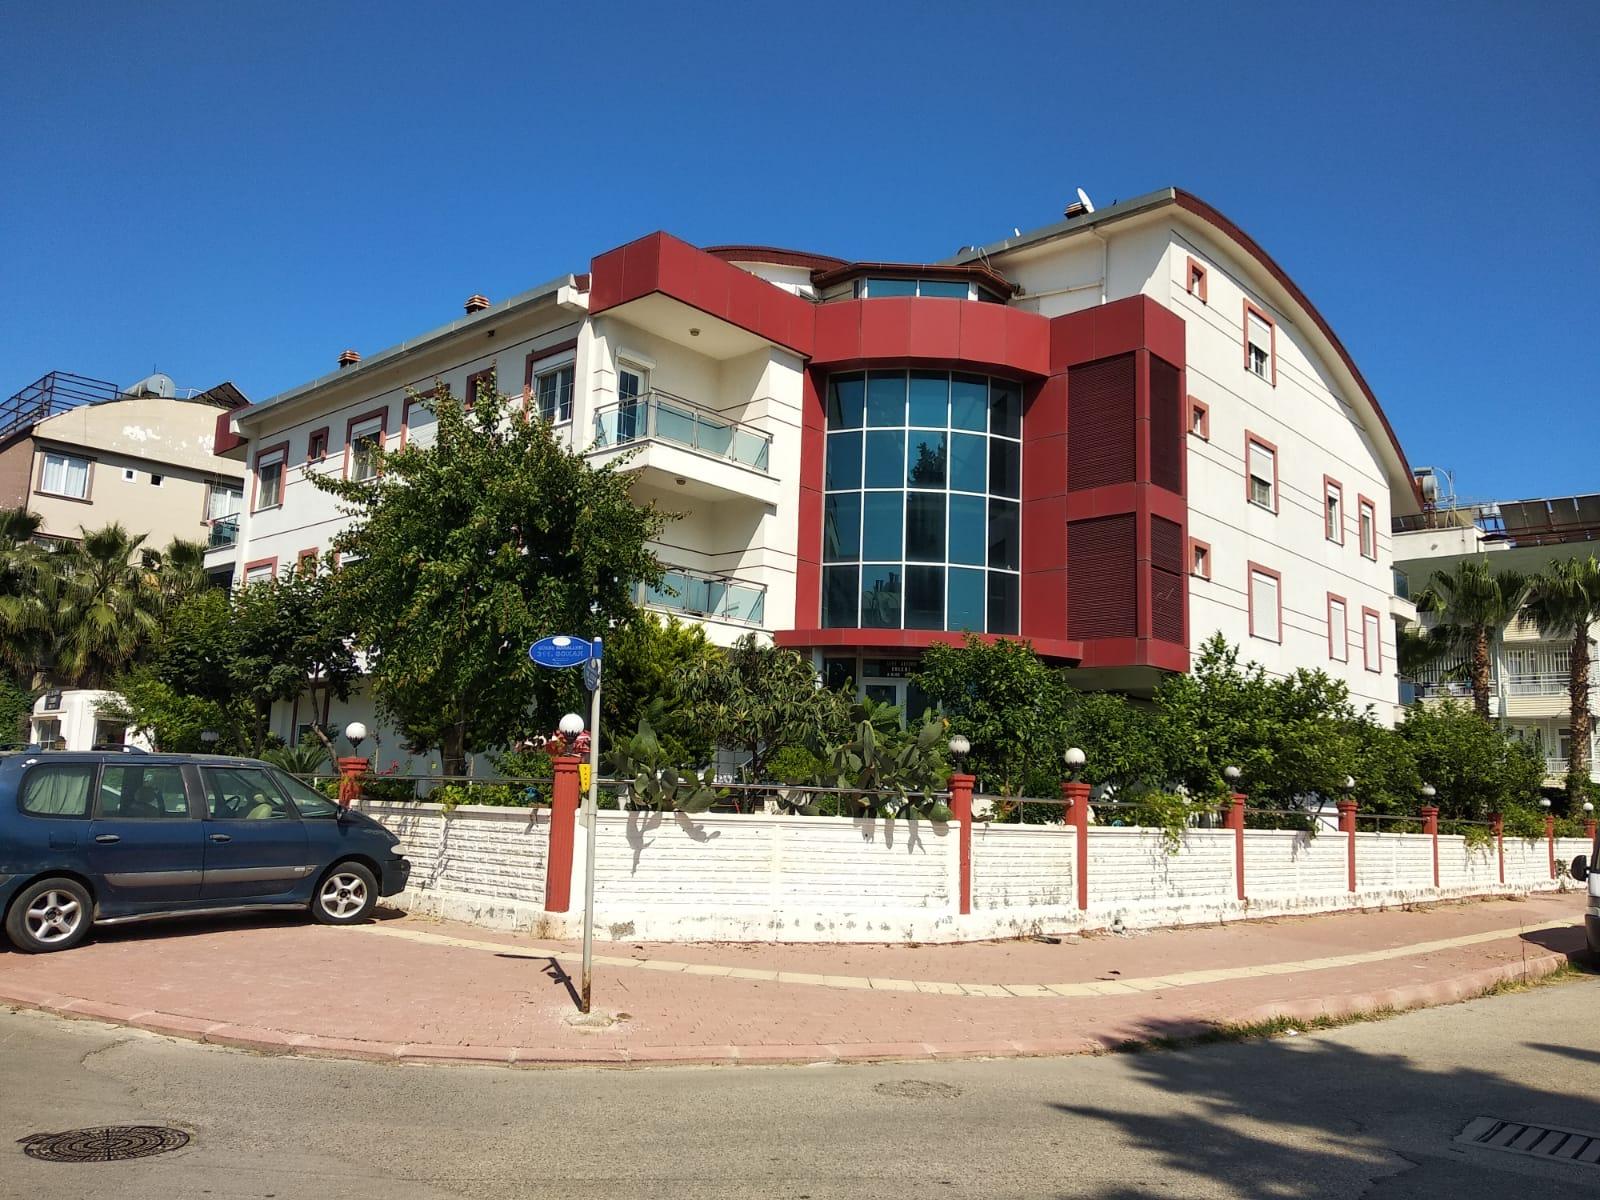 Antalya Classy Residential Complex 2